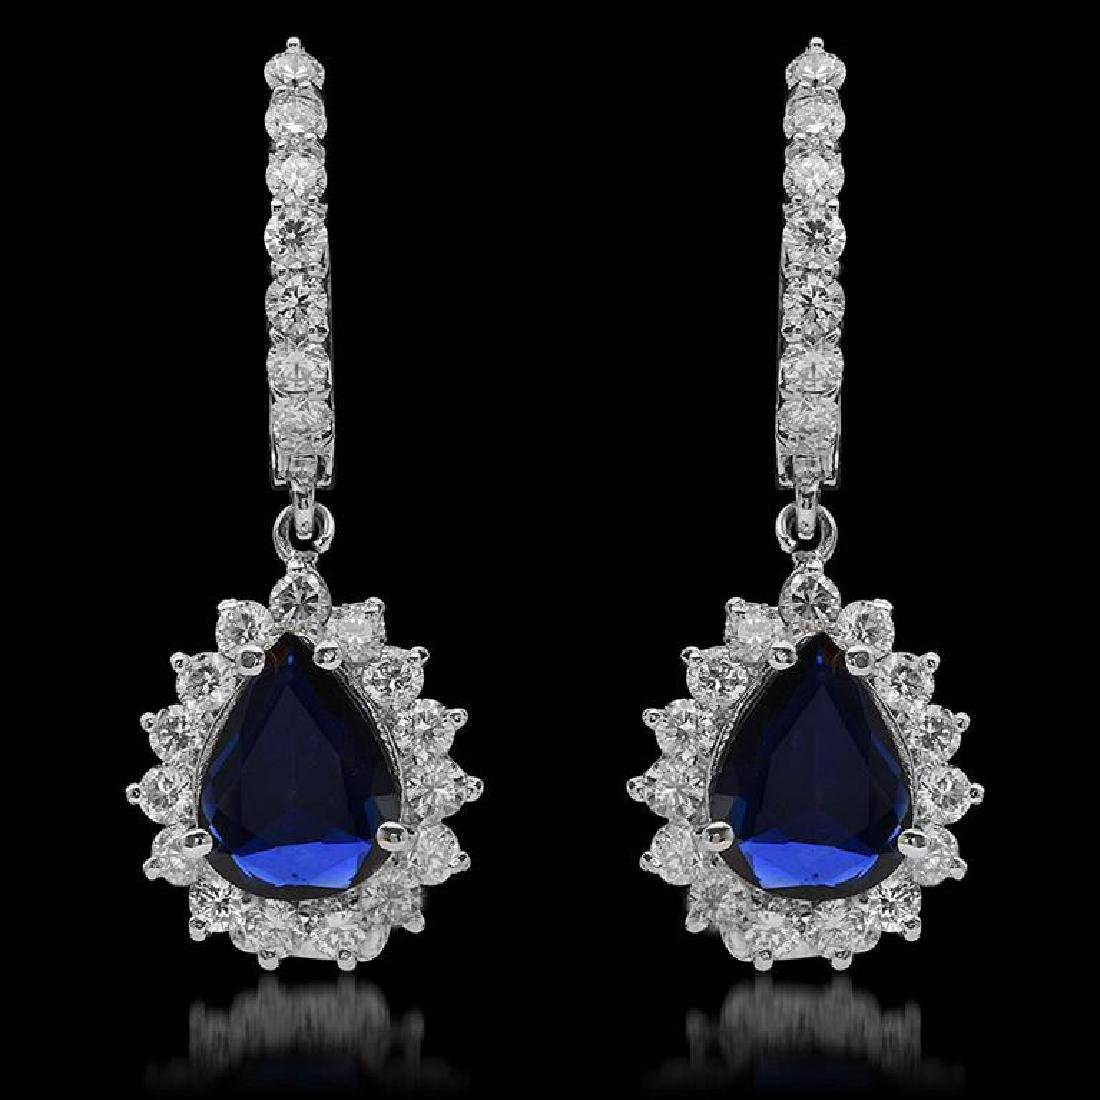 14K Gold 1.81ct Sapphire & 1.68ct Diamond Earrings